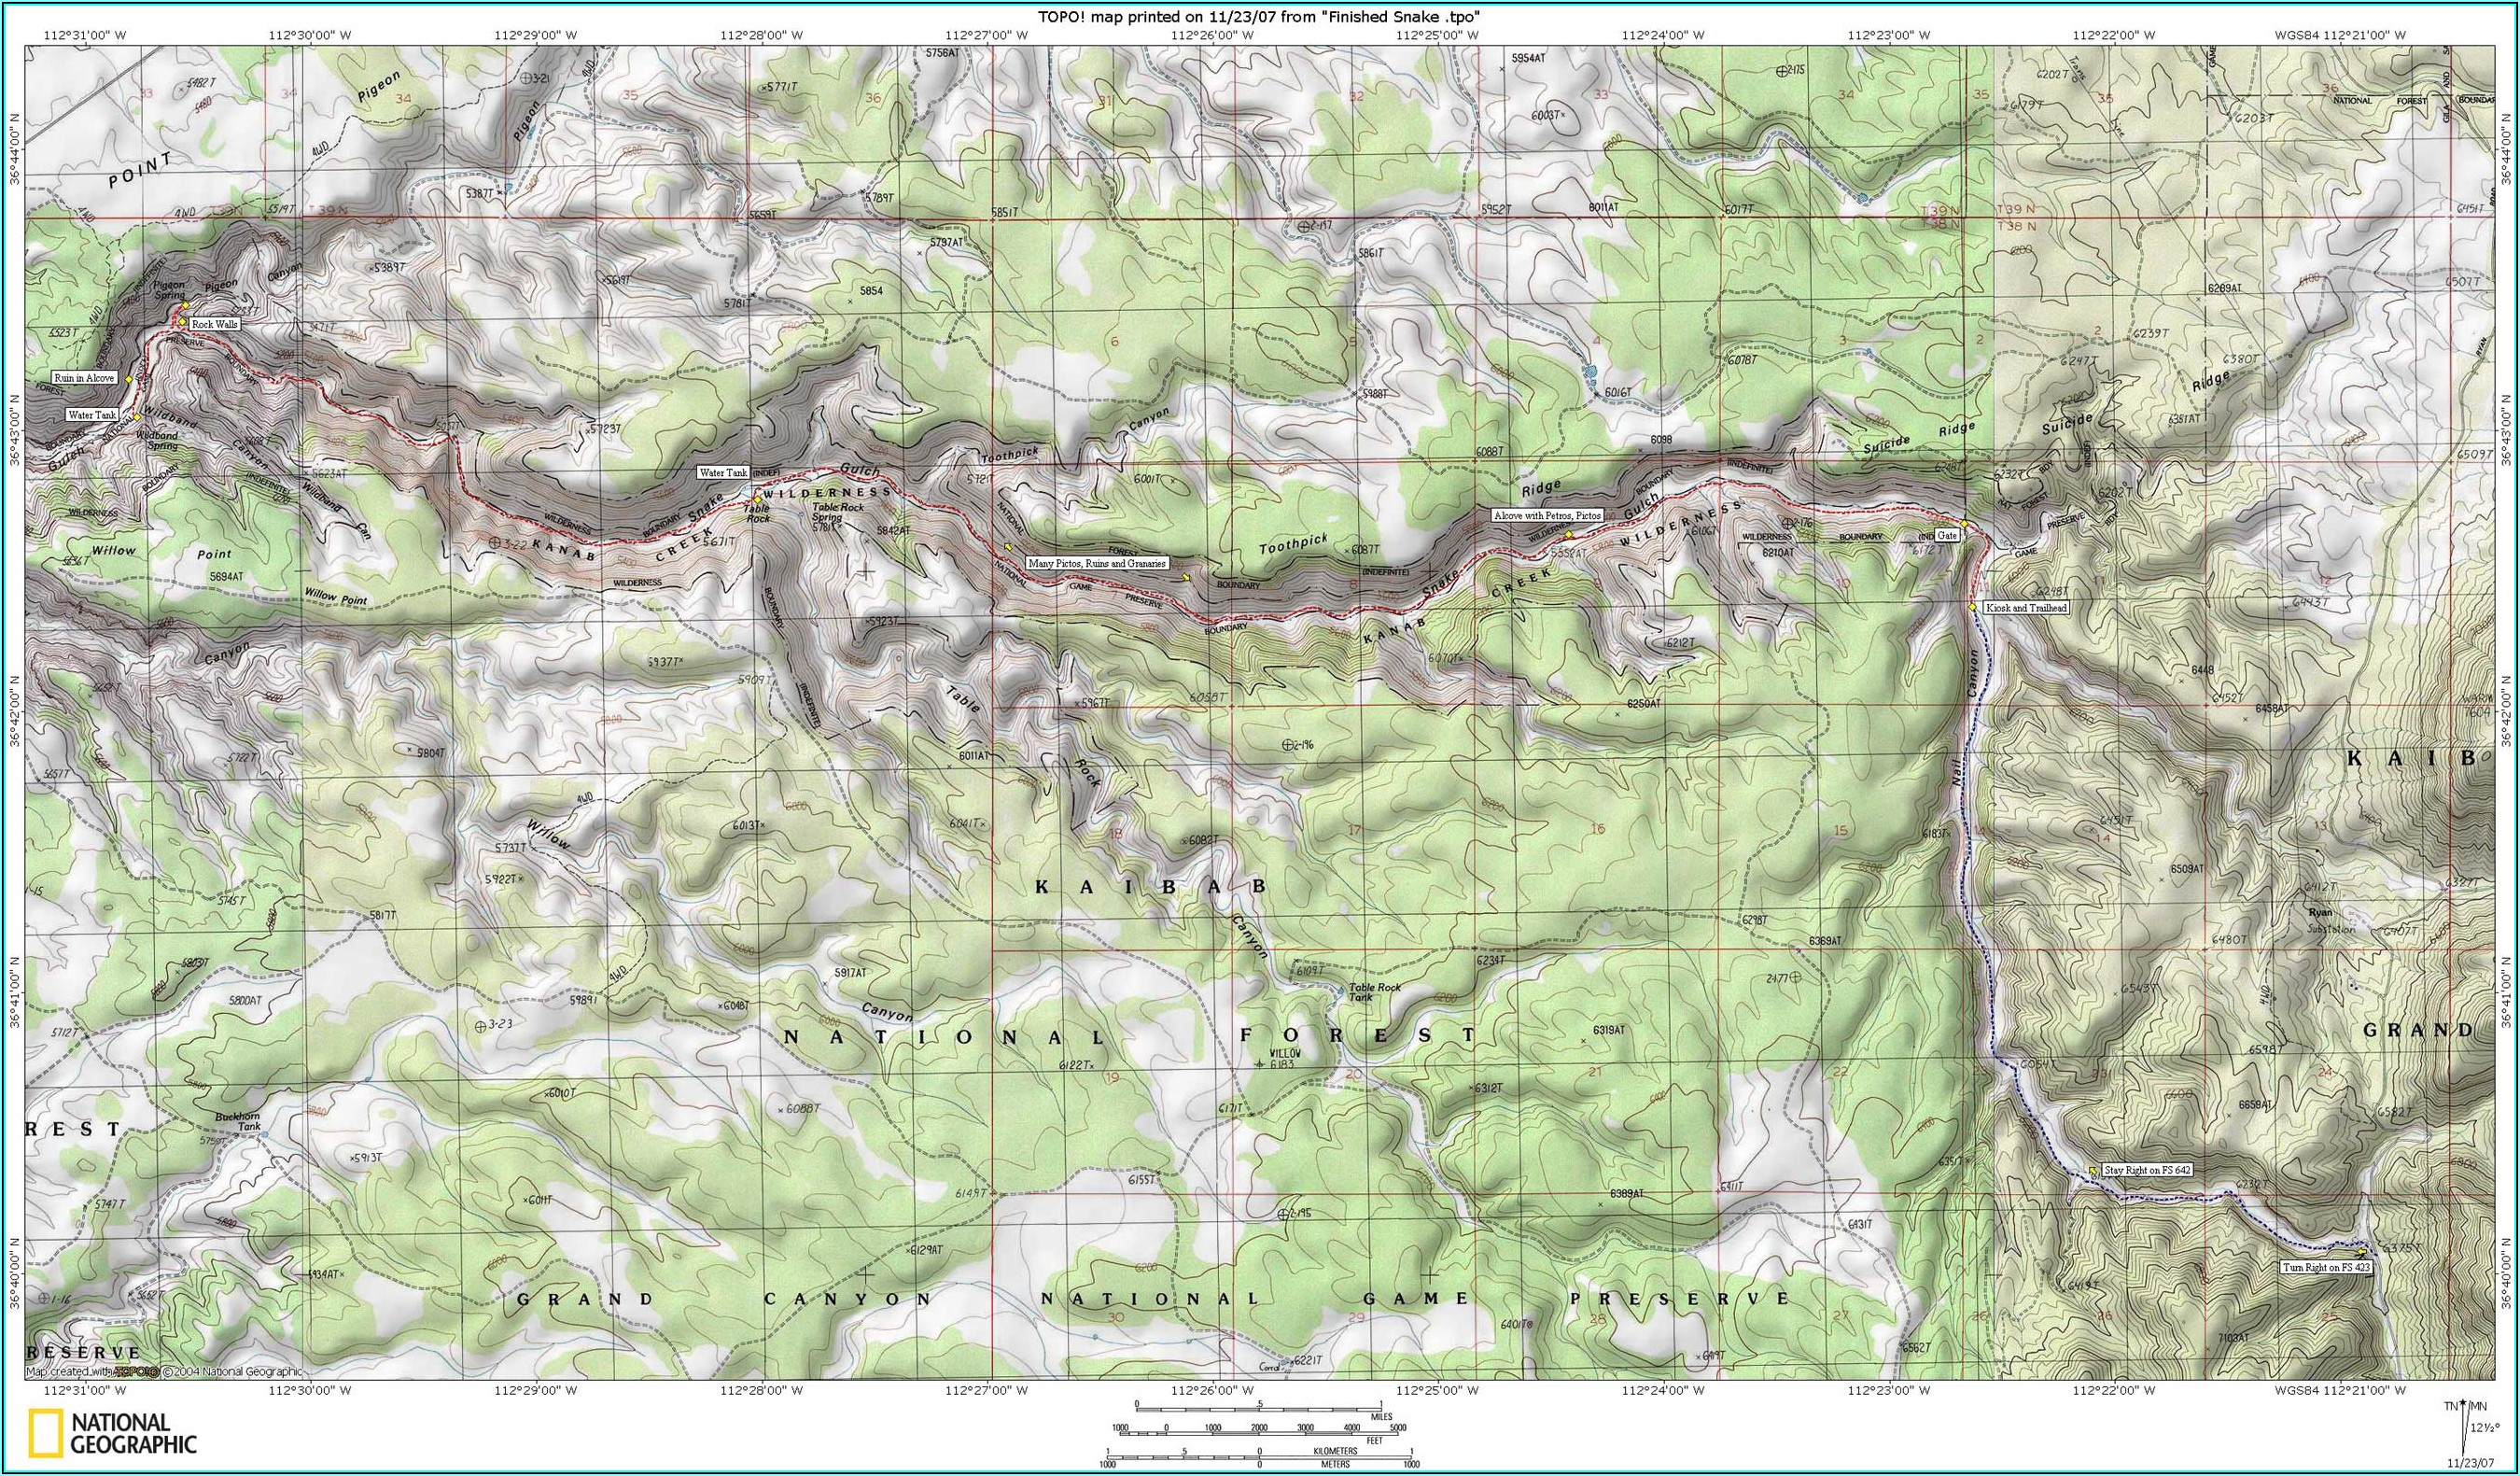 Grand Canyon Rim To Rim Topo Map